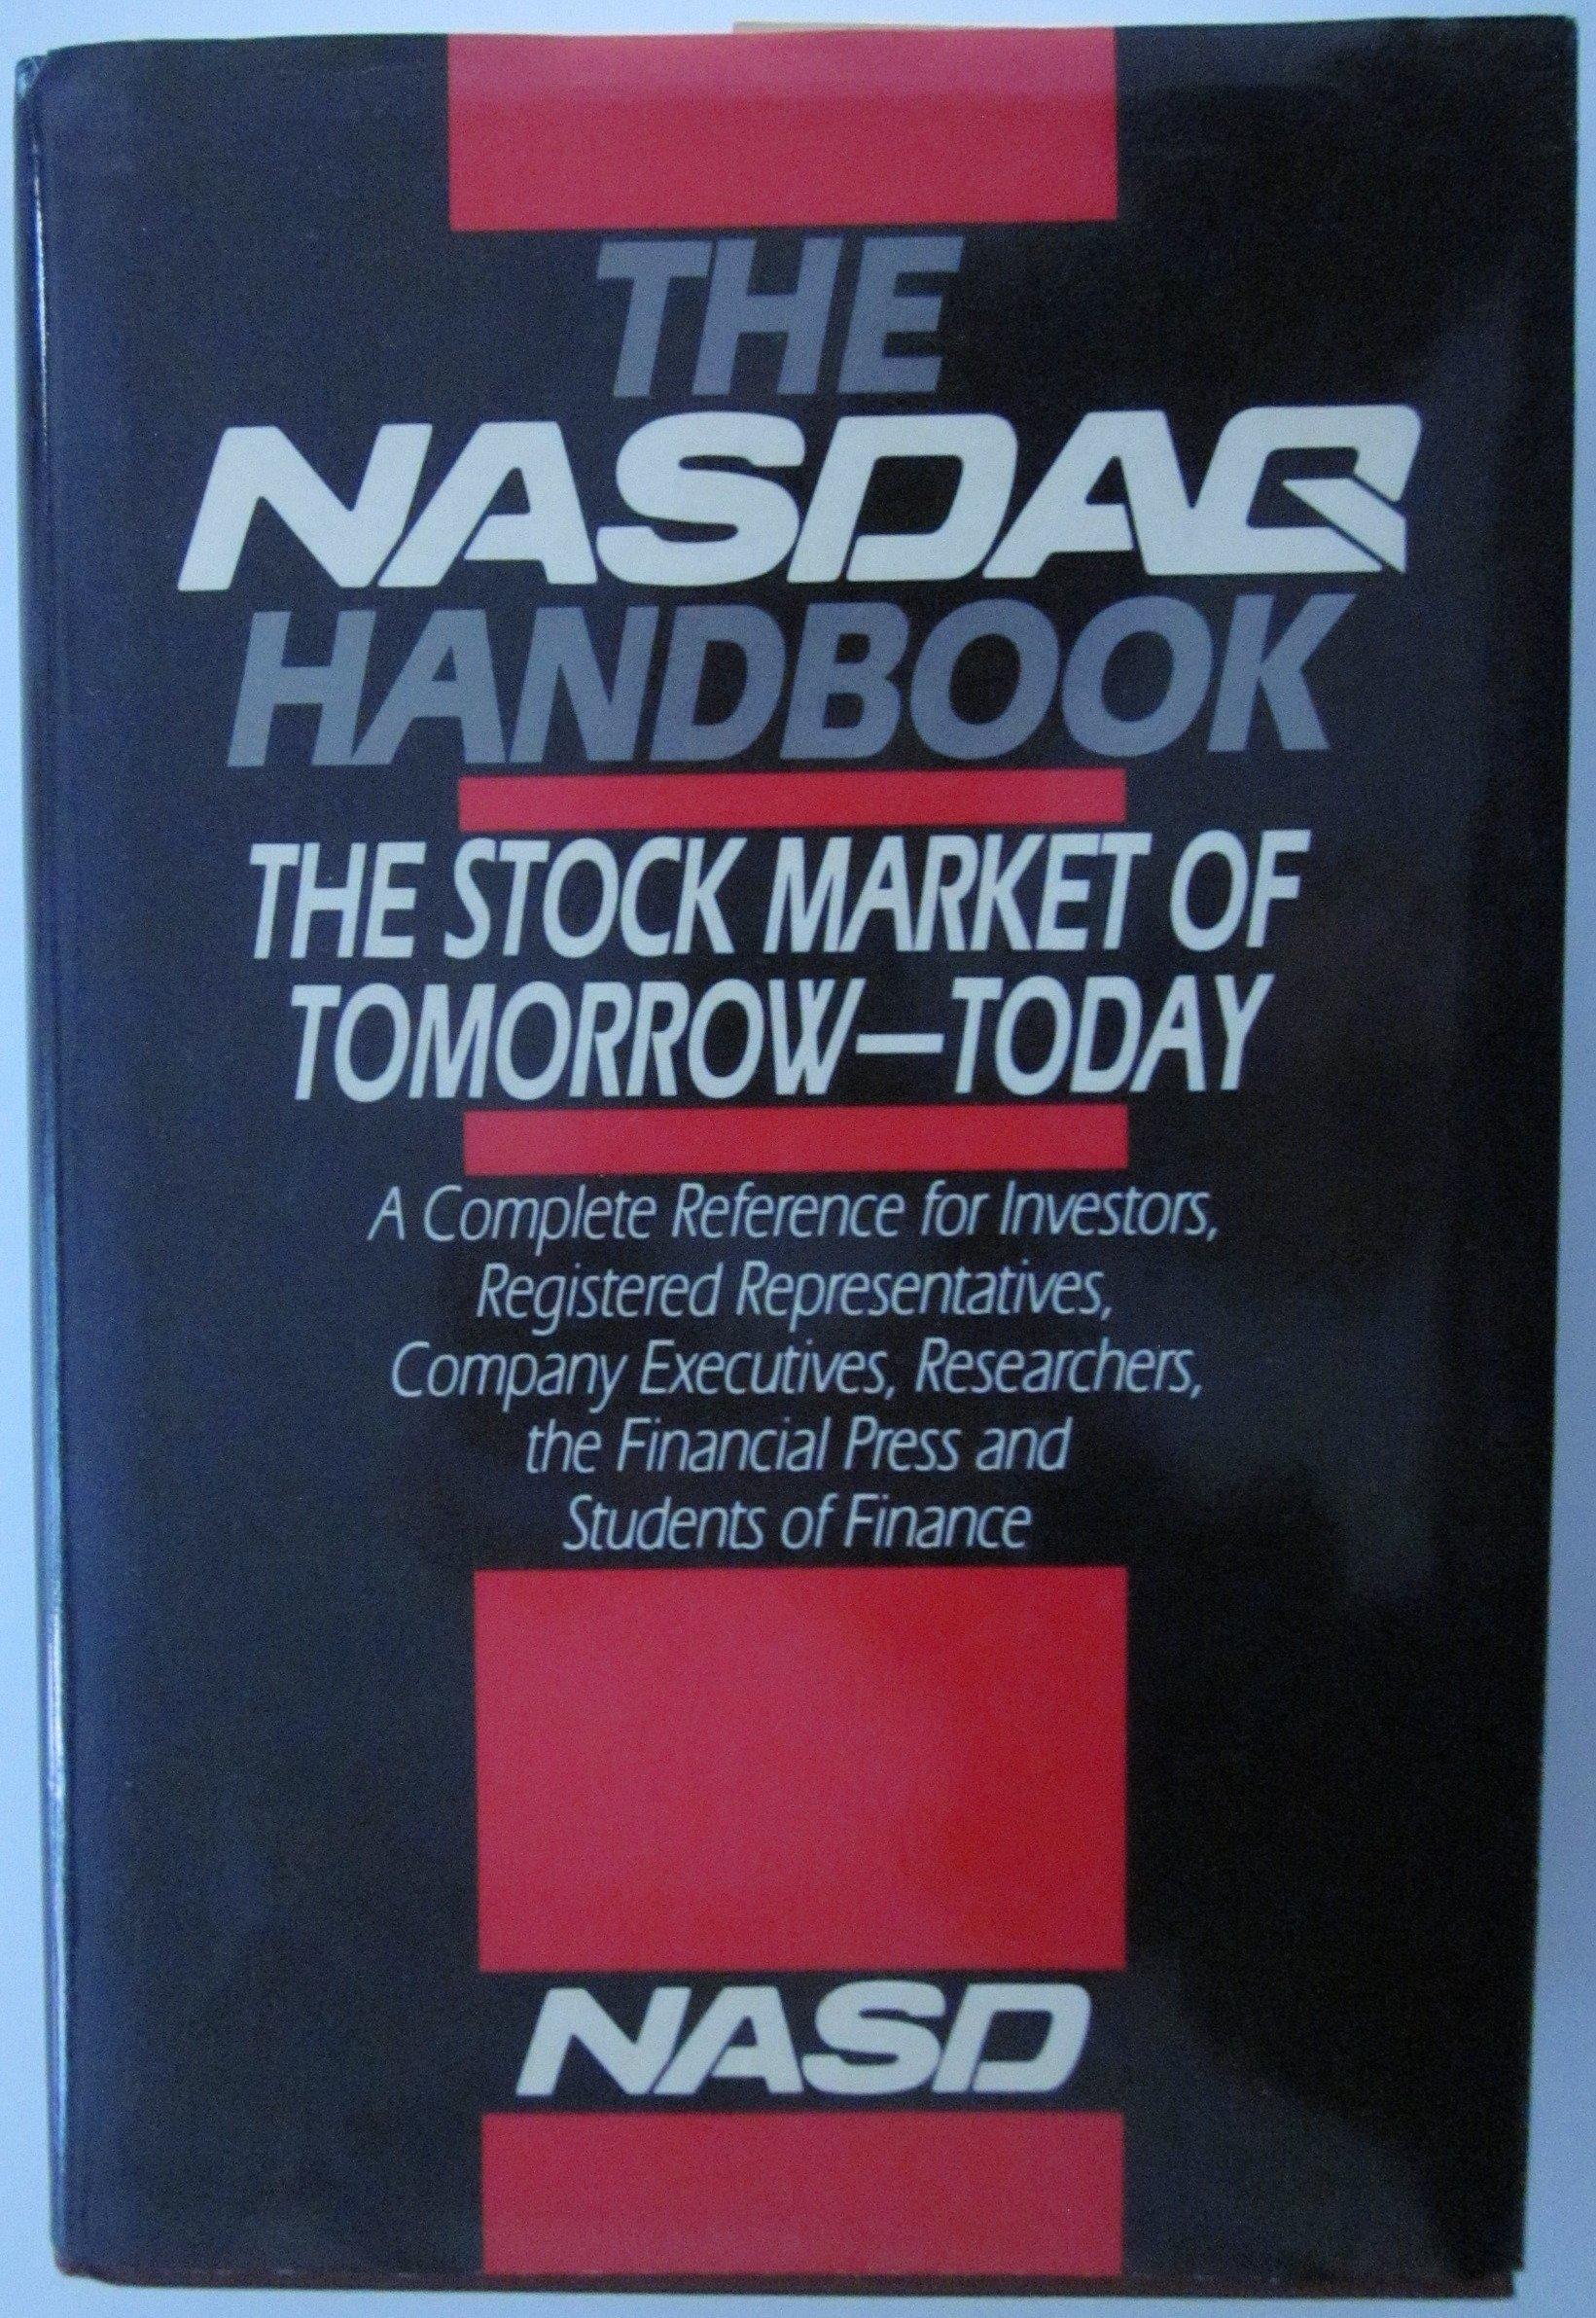 The NASDAQ Handbook: The Stock Market of Tomorrow-Today